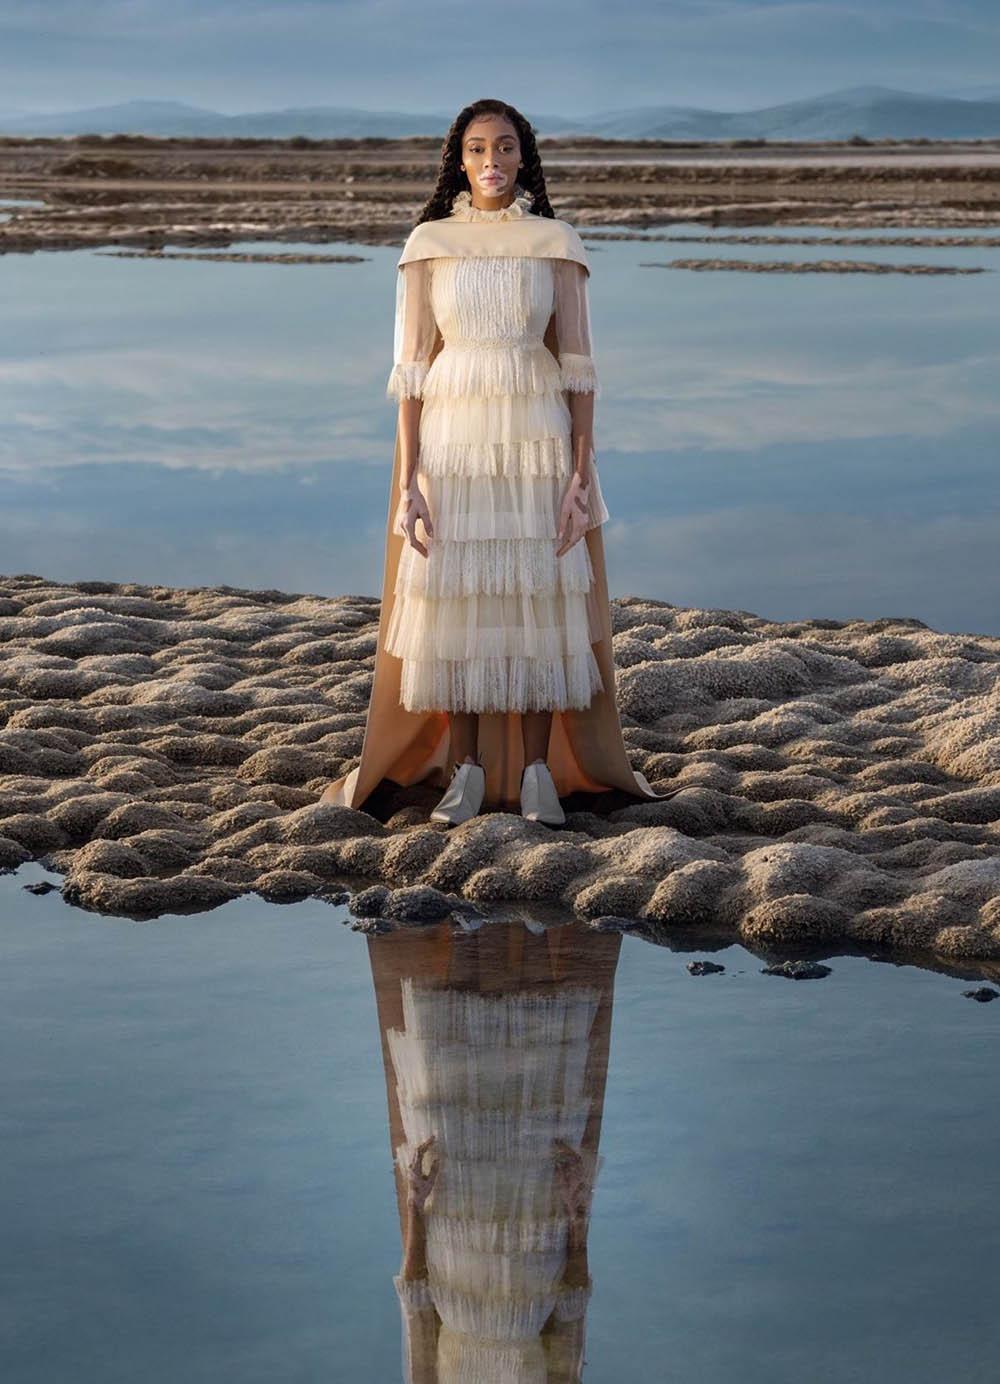 Winnie Harlow covers Vogue Greece February 2020 by Vasilis Kekatos